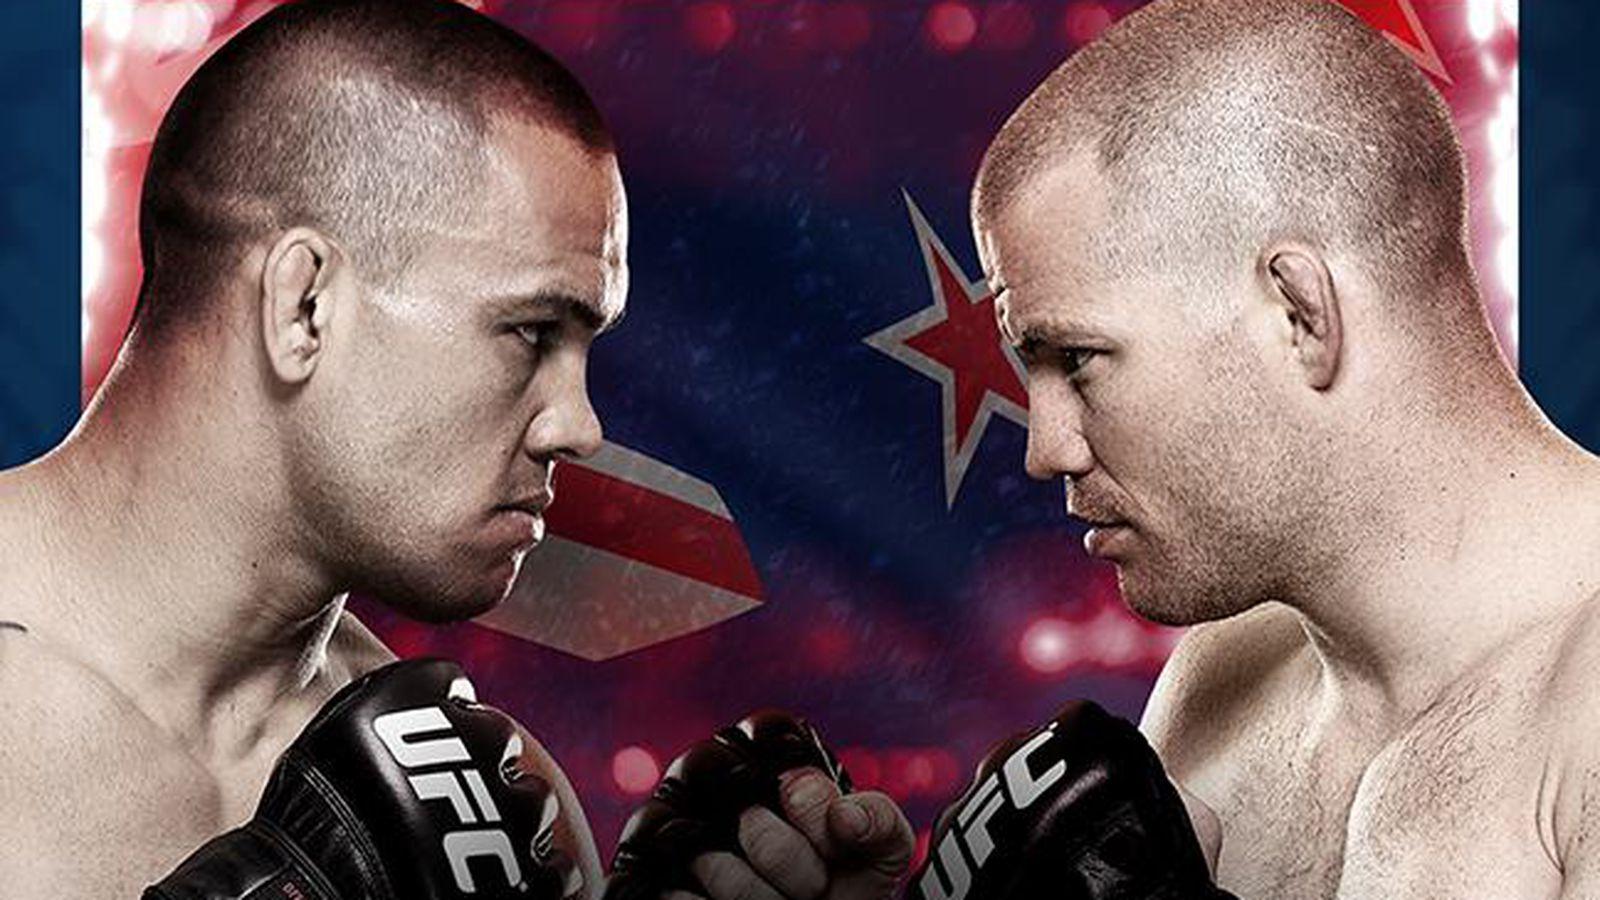 UFC搏击之夜43:'Te Huna vs Marquardt'现场结果和播放博客